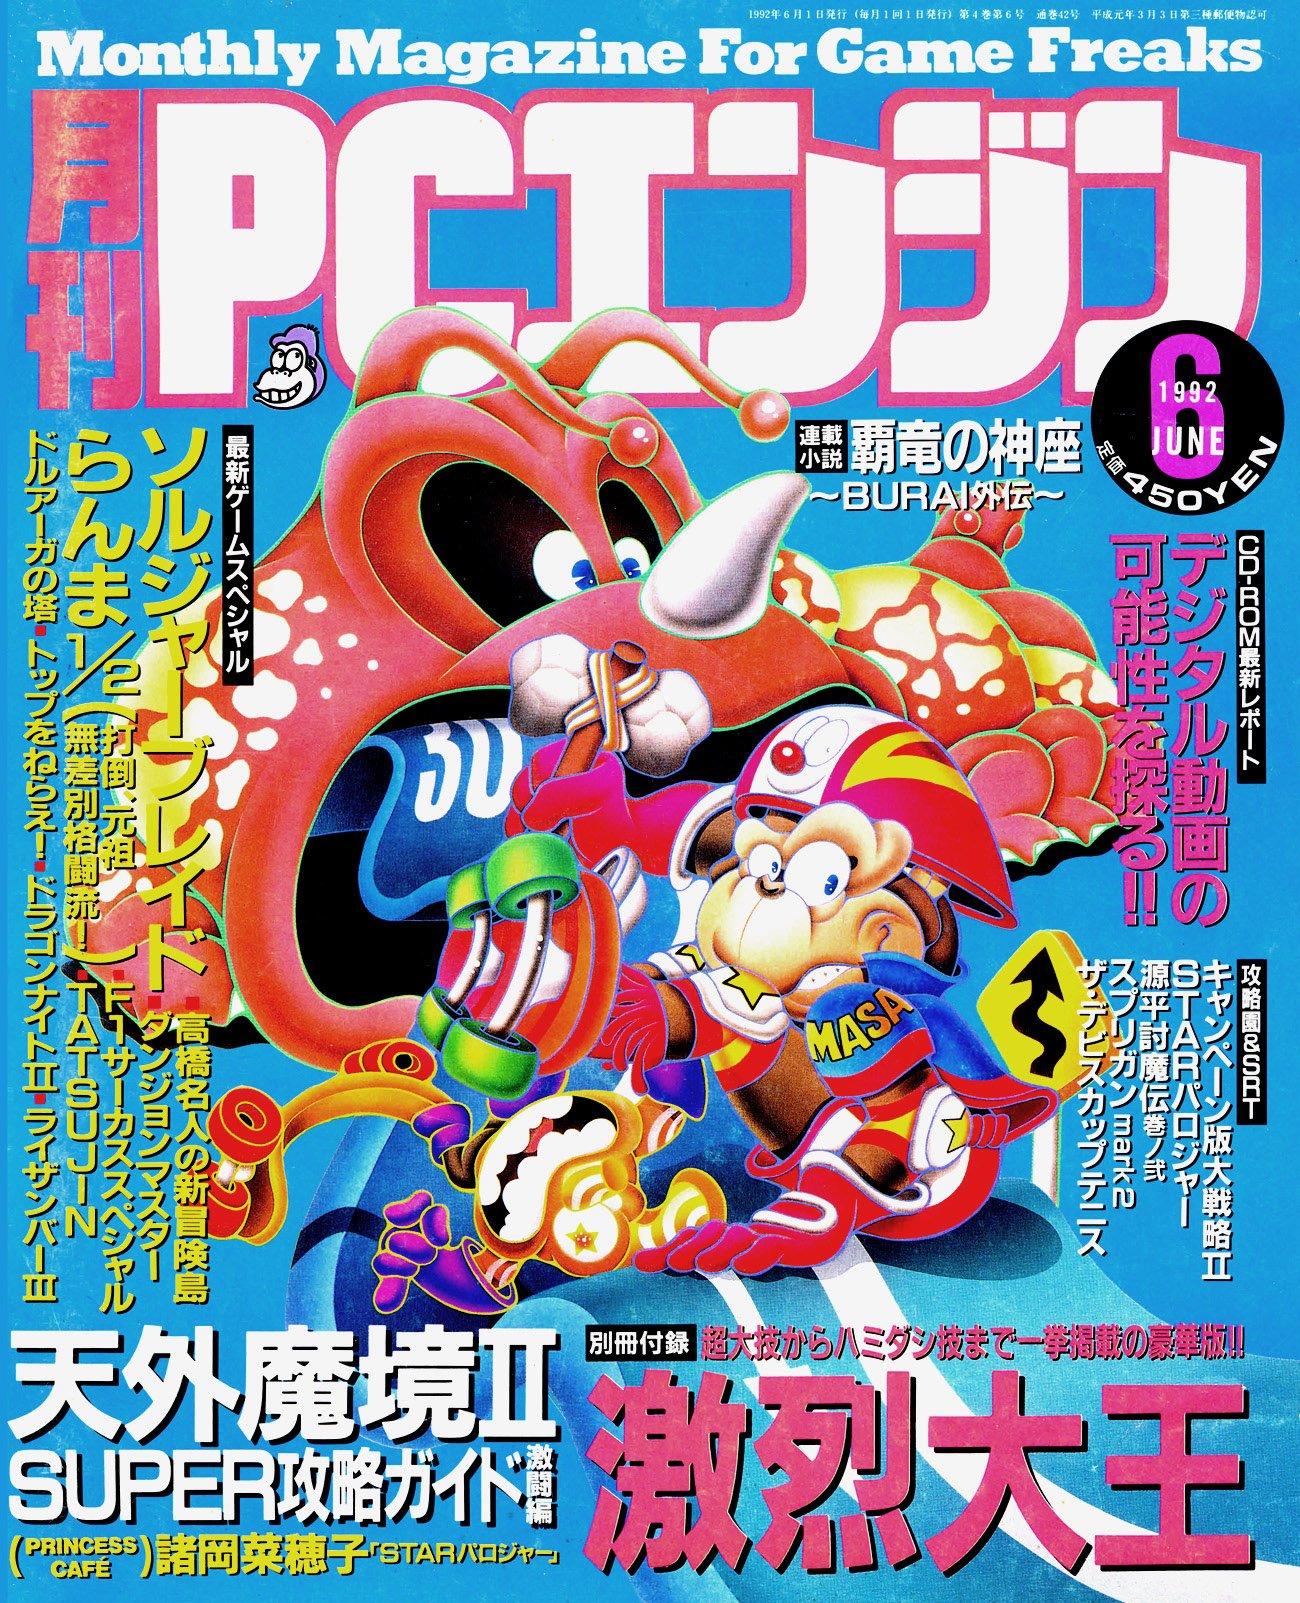 Gekkan PC Engine Issue 42 (June 1992)